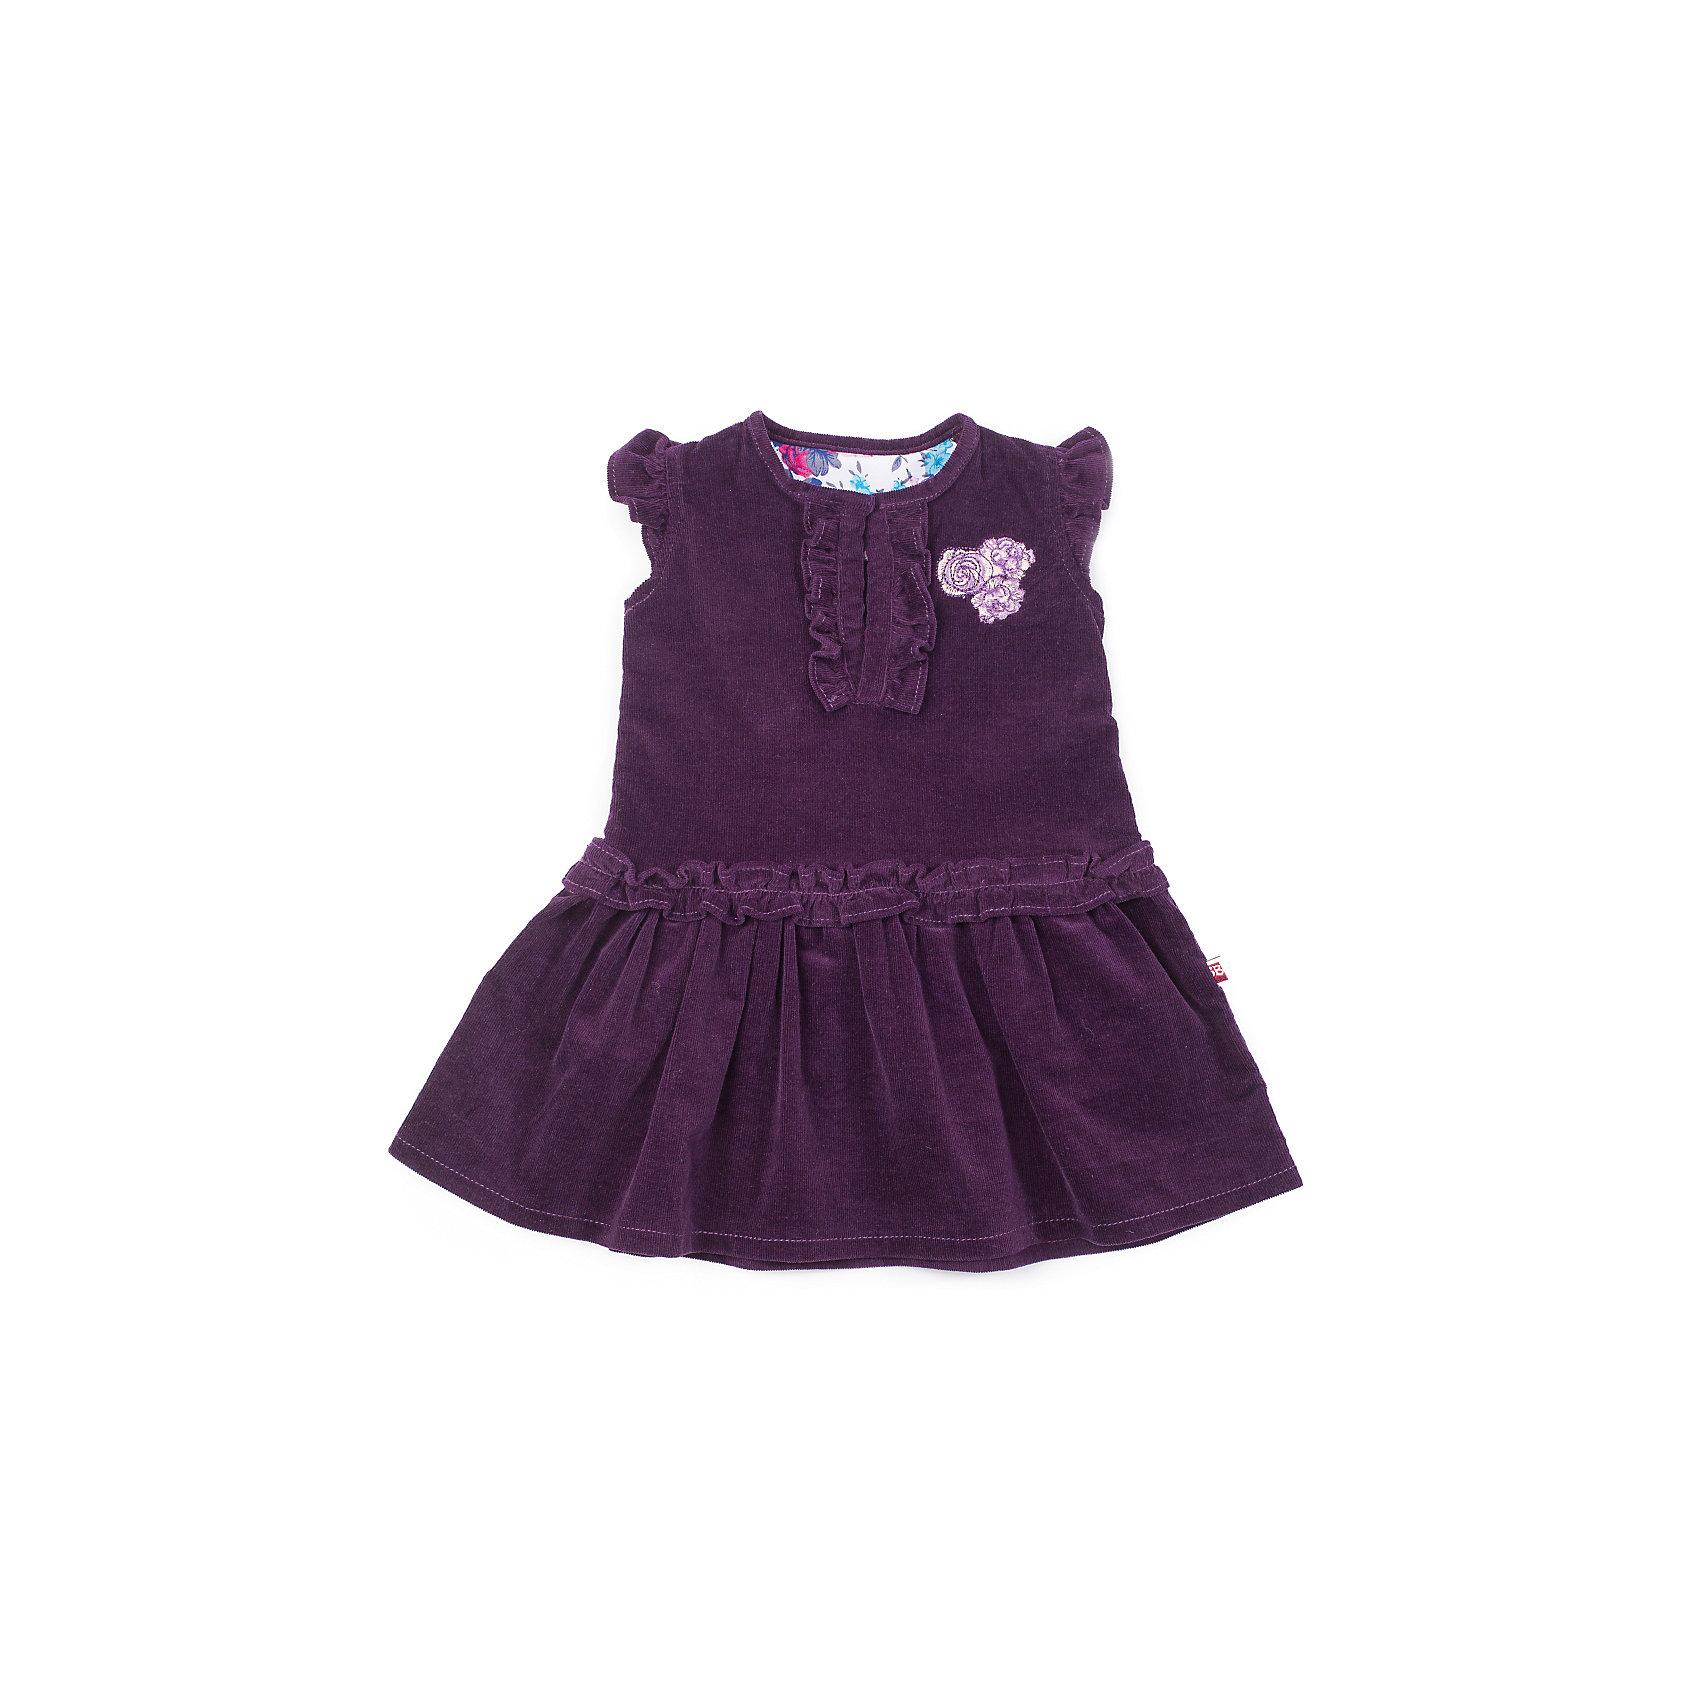 Сарафан Sweet BerryСарафан вельветовый на девочку, рукава - крылышки, украшен рюшами, планкой с пуговками и вышивкой.<br>Состав:<br>98% хлопок, 2% эластан<br><br>Ширина мм: 236<br>Глубина мм: 16<br>Высота мм: 184<br>Вес г: 177<br>Цвет: фиолетовый<br>Возраст от месяцев: 9<br>Возраст до месяцев: 12<br>Пол: Женский<br>Возраст: Детский<br>Размер: 80,92,98,86<br>SKU: 4272690